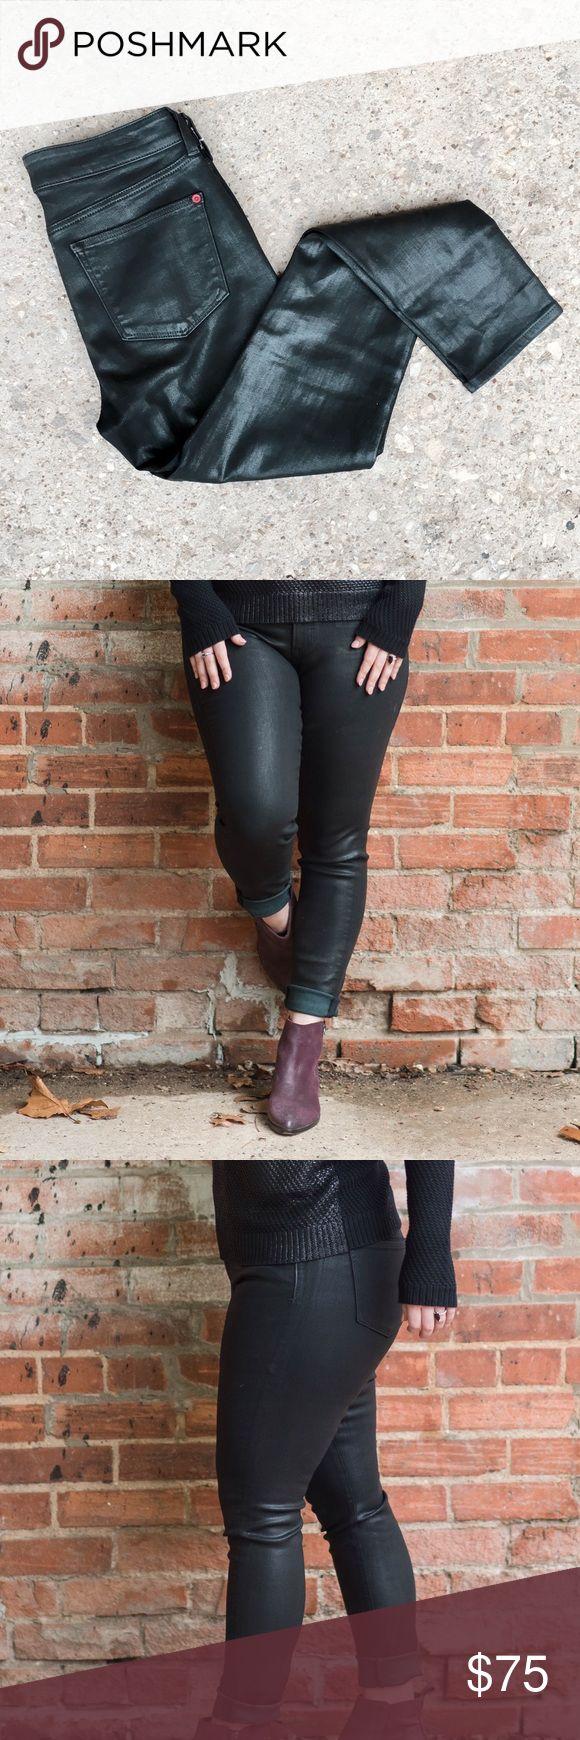 "Spanx Jeans Waxed finish Spanx® jeans. 5-pocket jean. ""Very Black."" SPANX Pants Skinny"